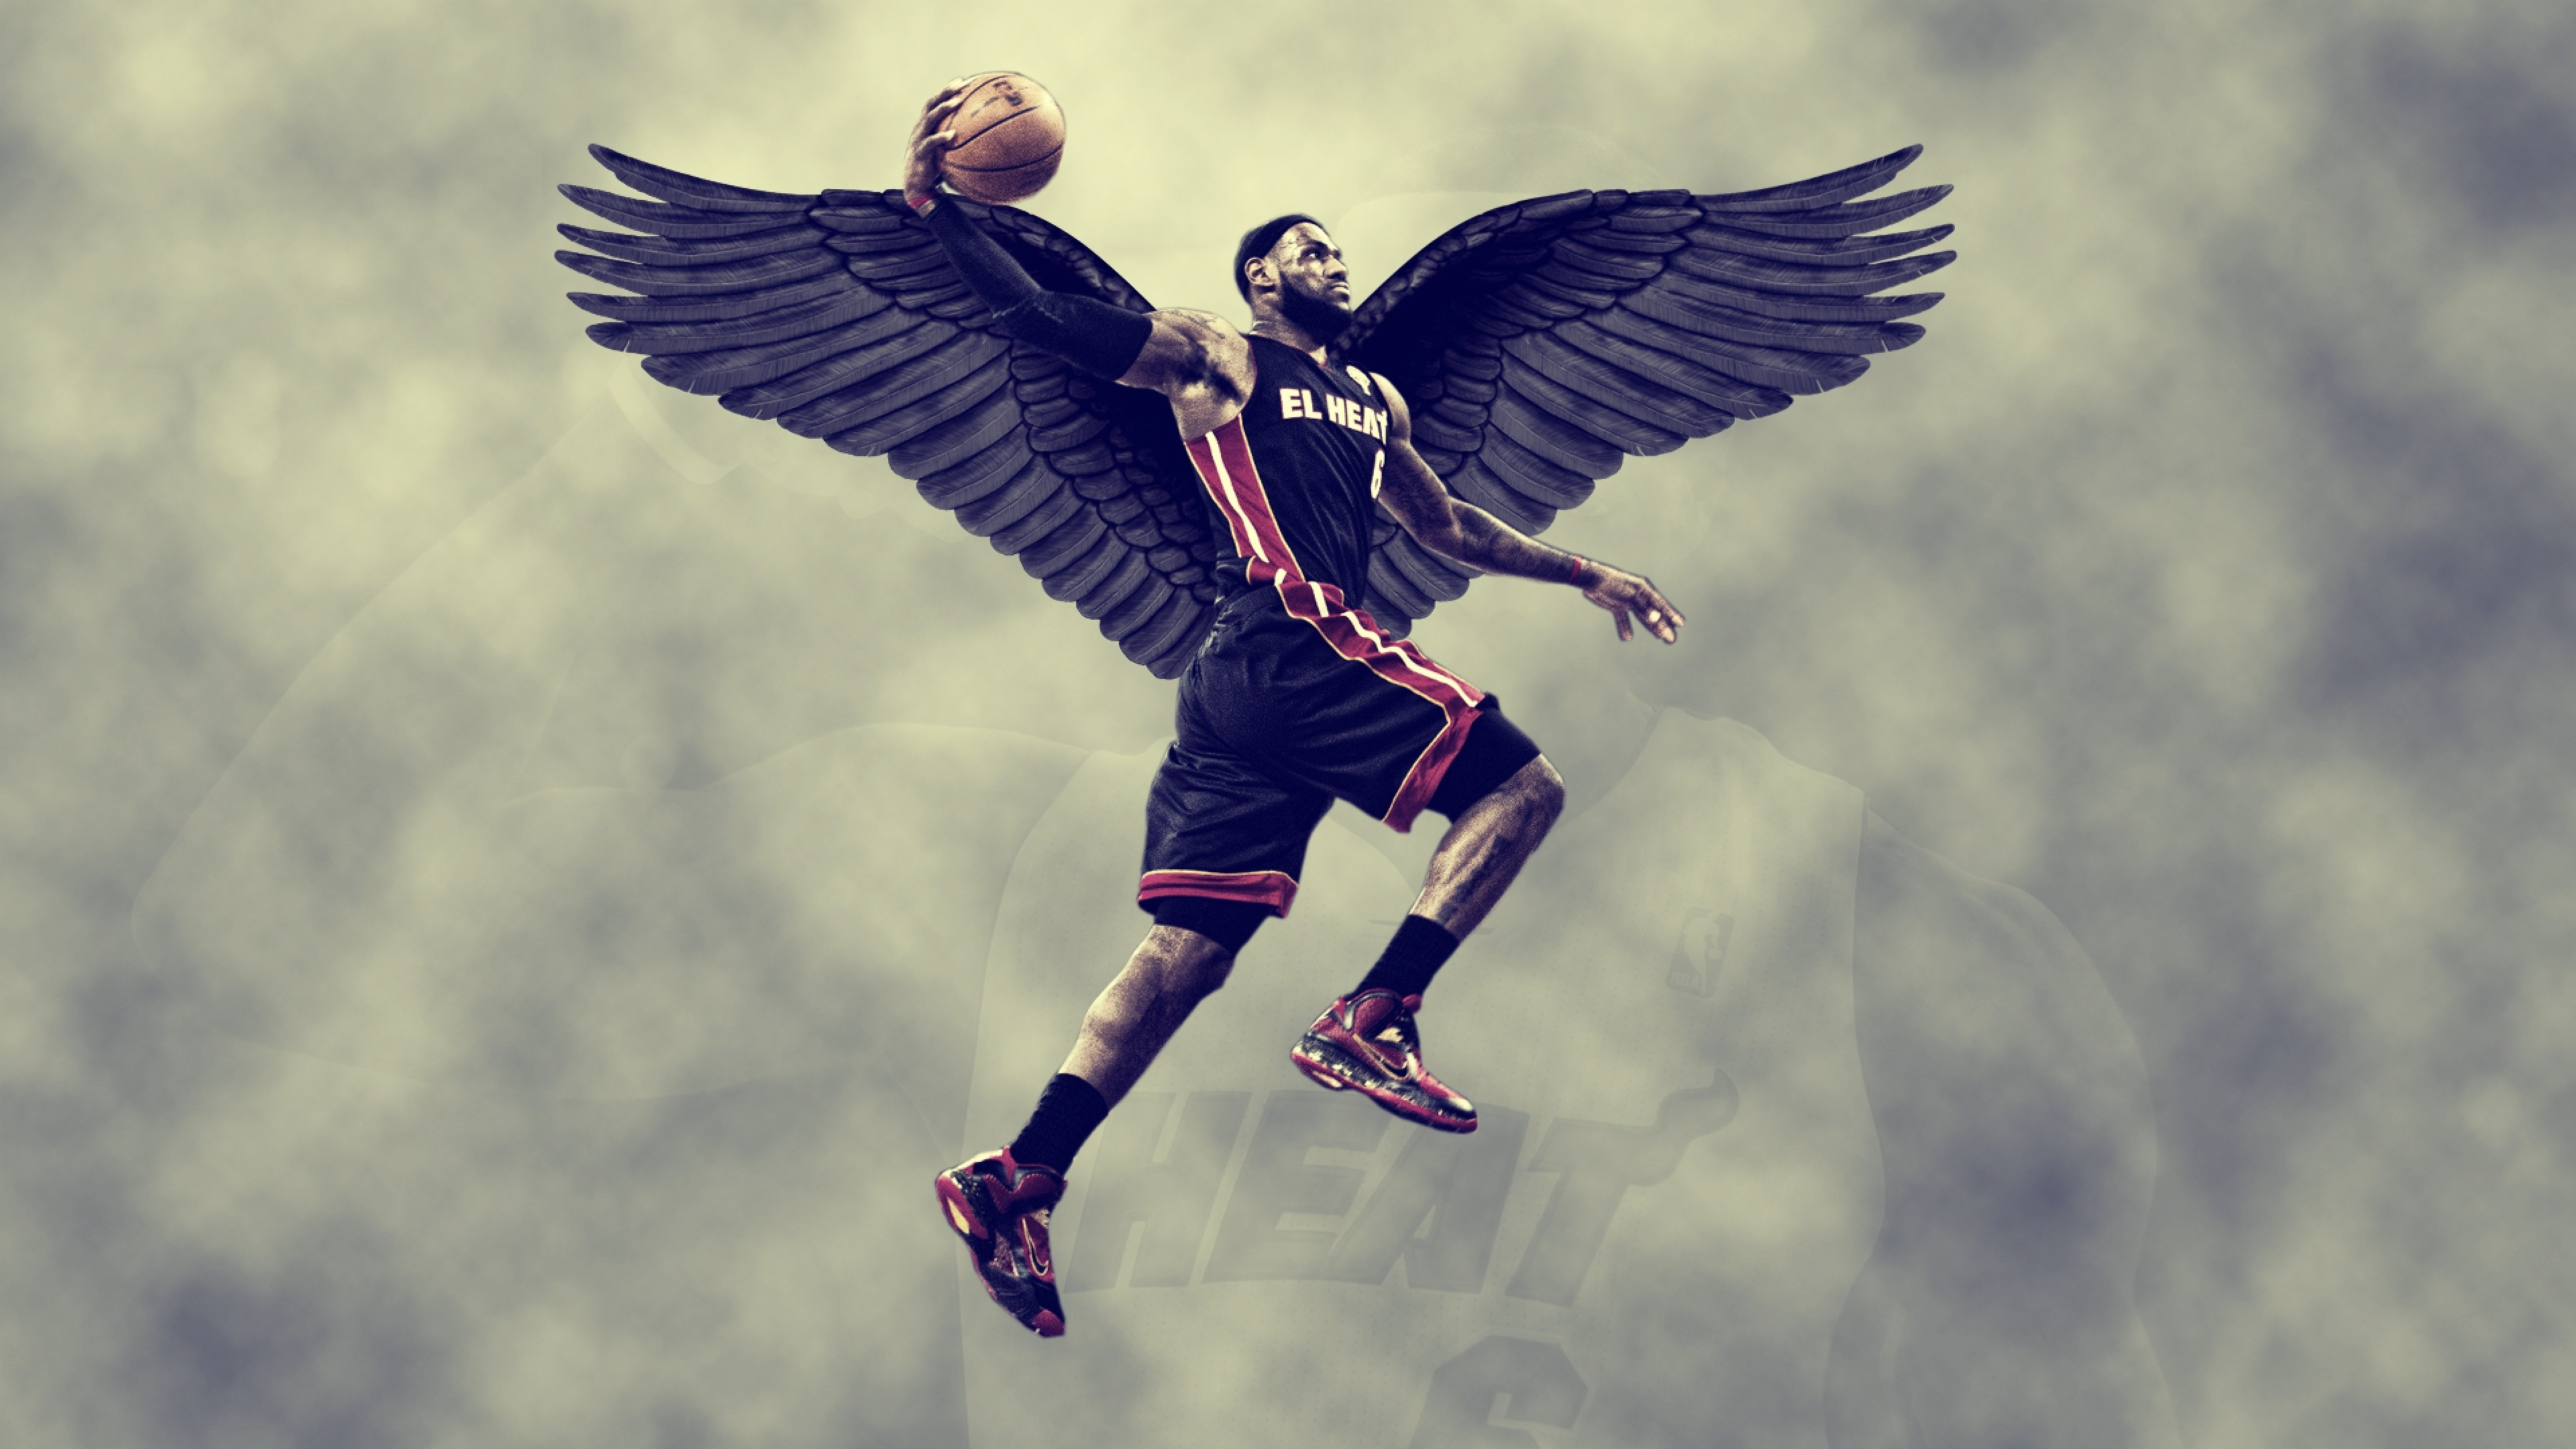 Preview wallpaper lebron james, miami heat, wings, sky, basketball 3840×2160